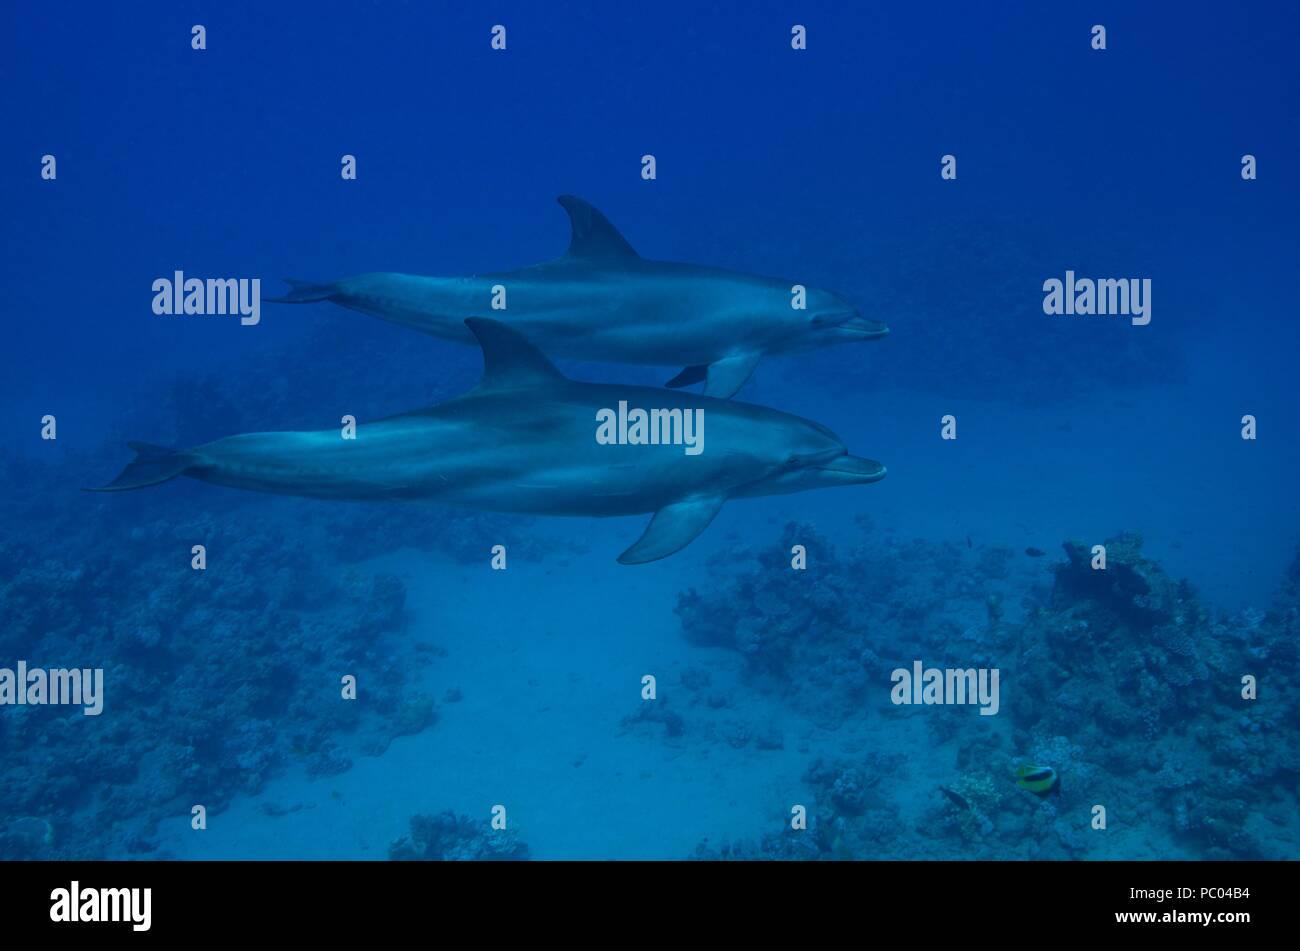 Indo-Pacific bottlenose dolphin, Indopazifischer Großer Tümmler, Tursiops aduncus, Coraya Beach, Marsa Alam, Egypt, Ägypten, Red Sea, Rotes Meer - Stock Image